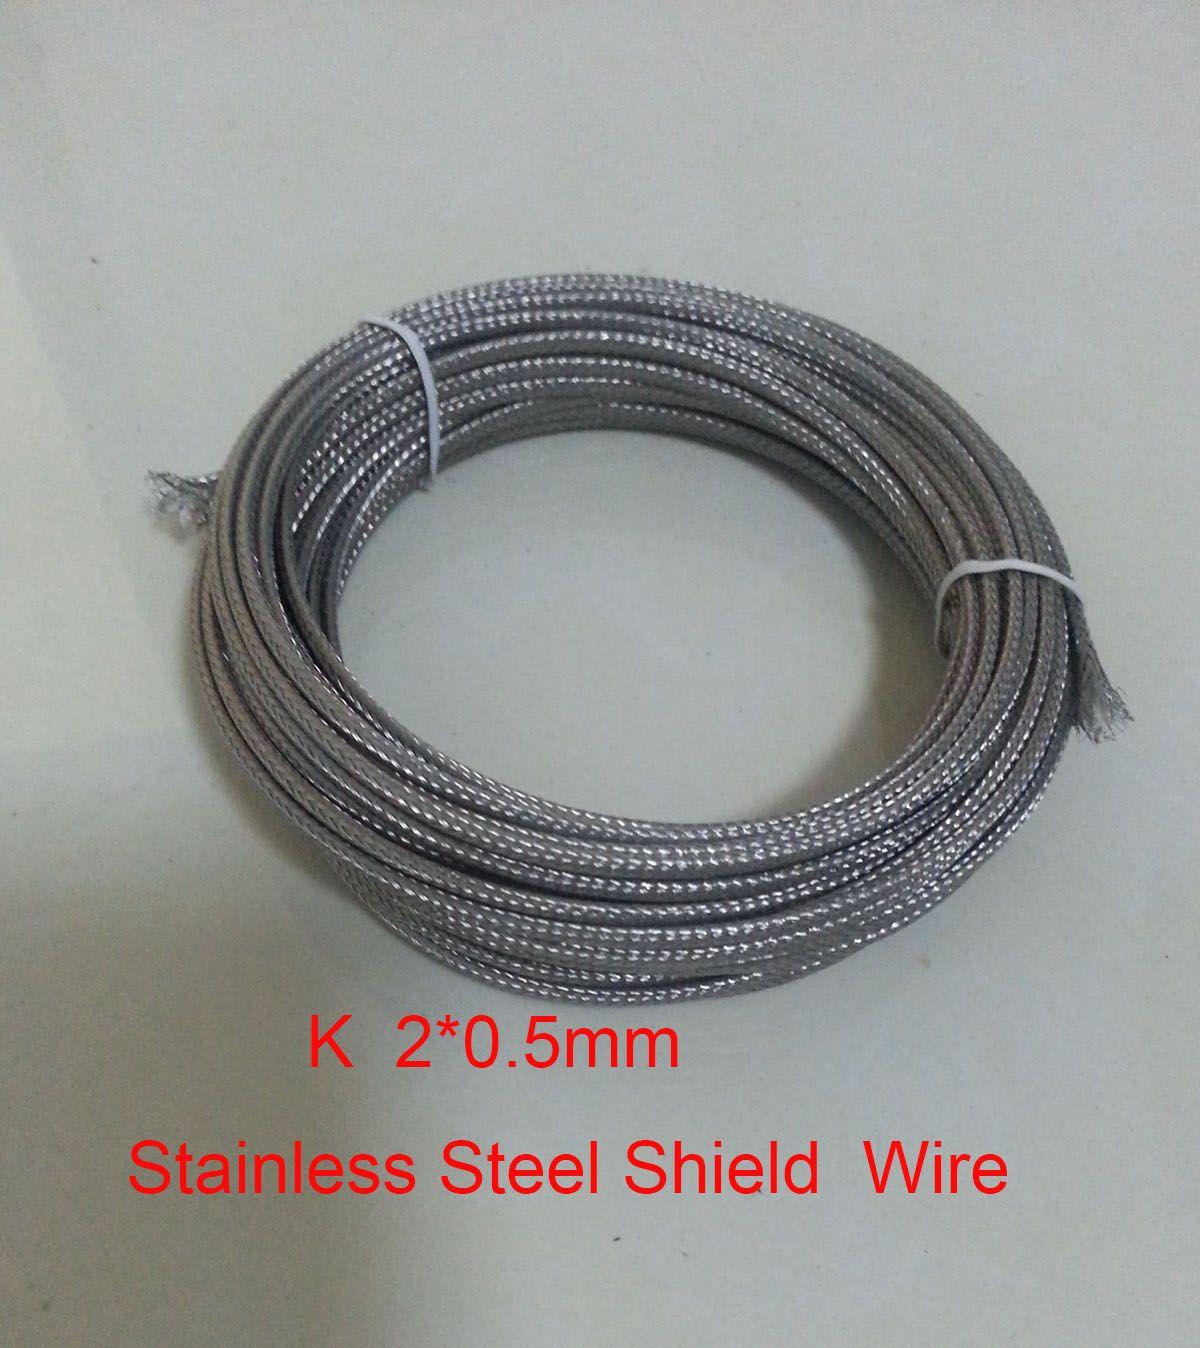 10 2 Metal Shield Wire - WIRE Center •